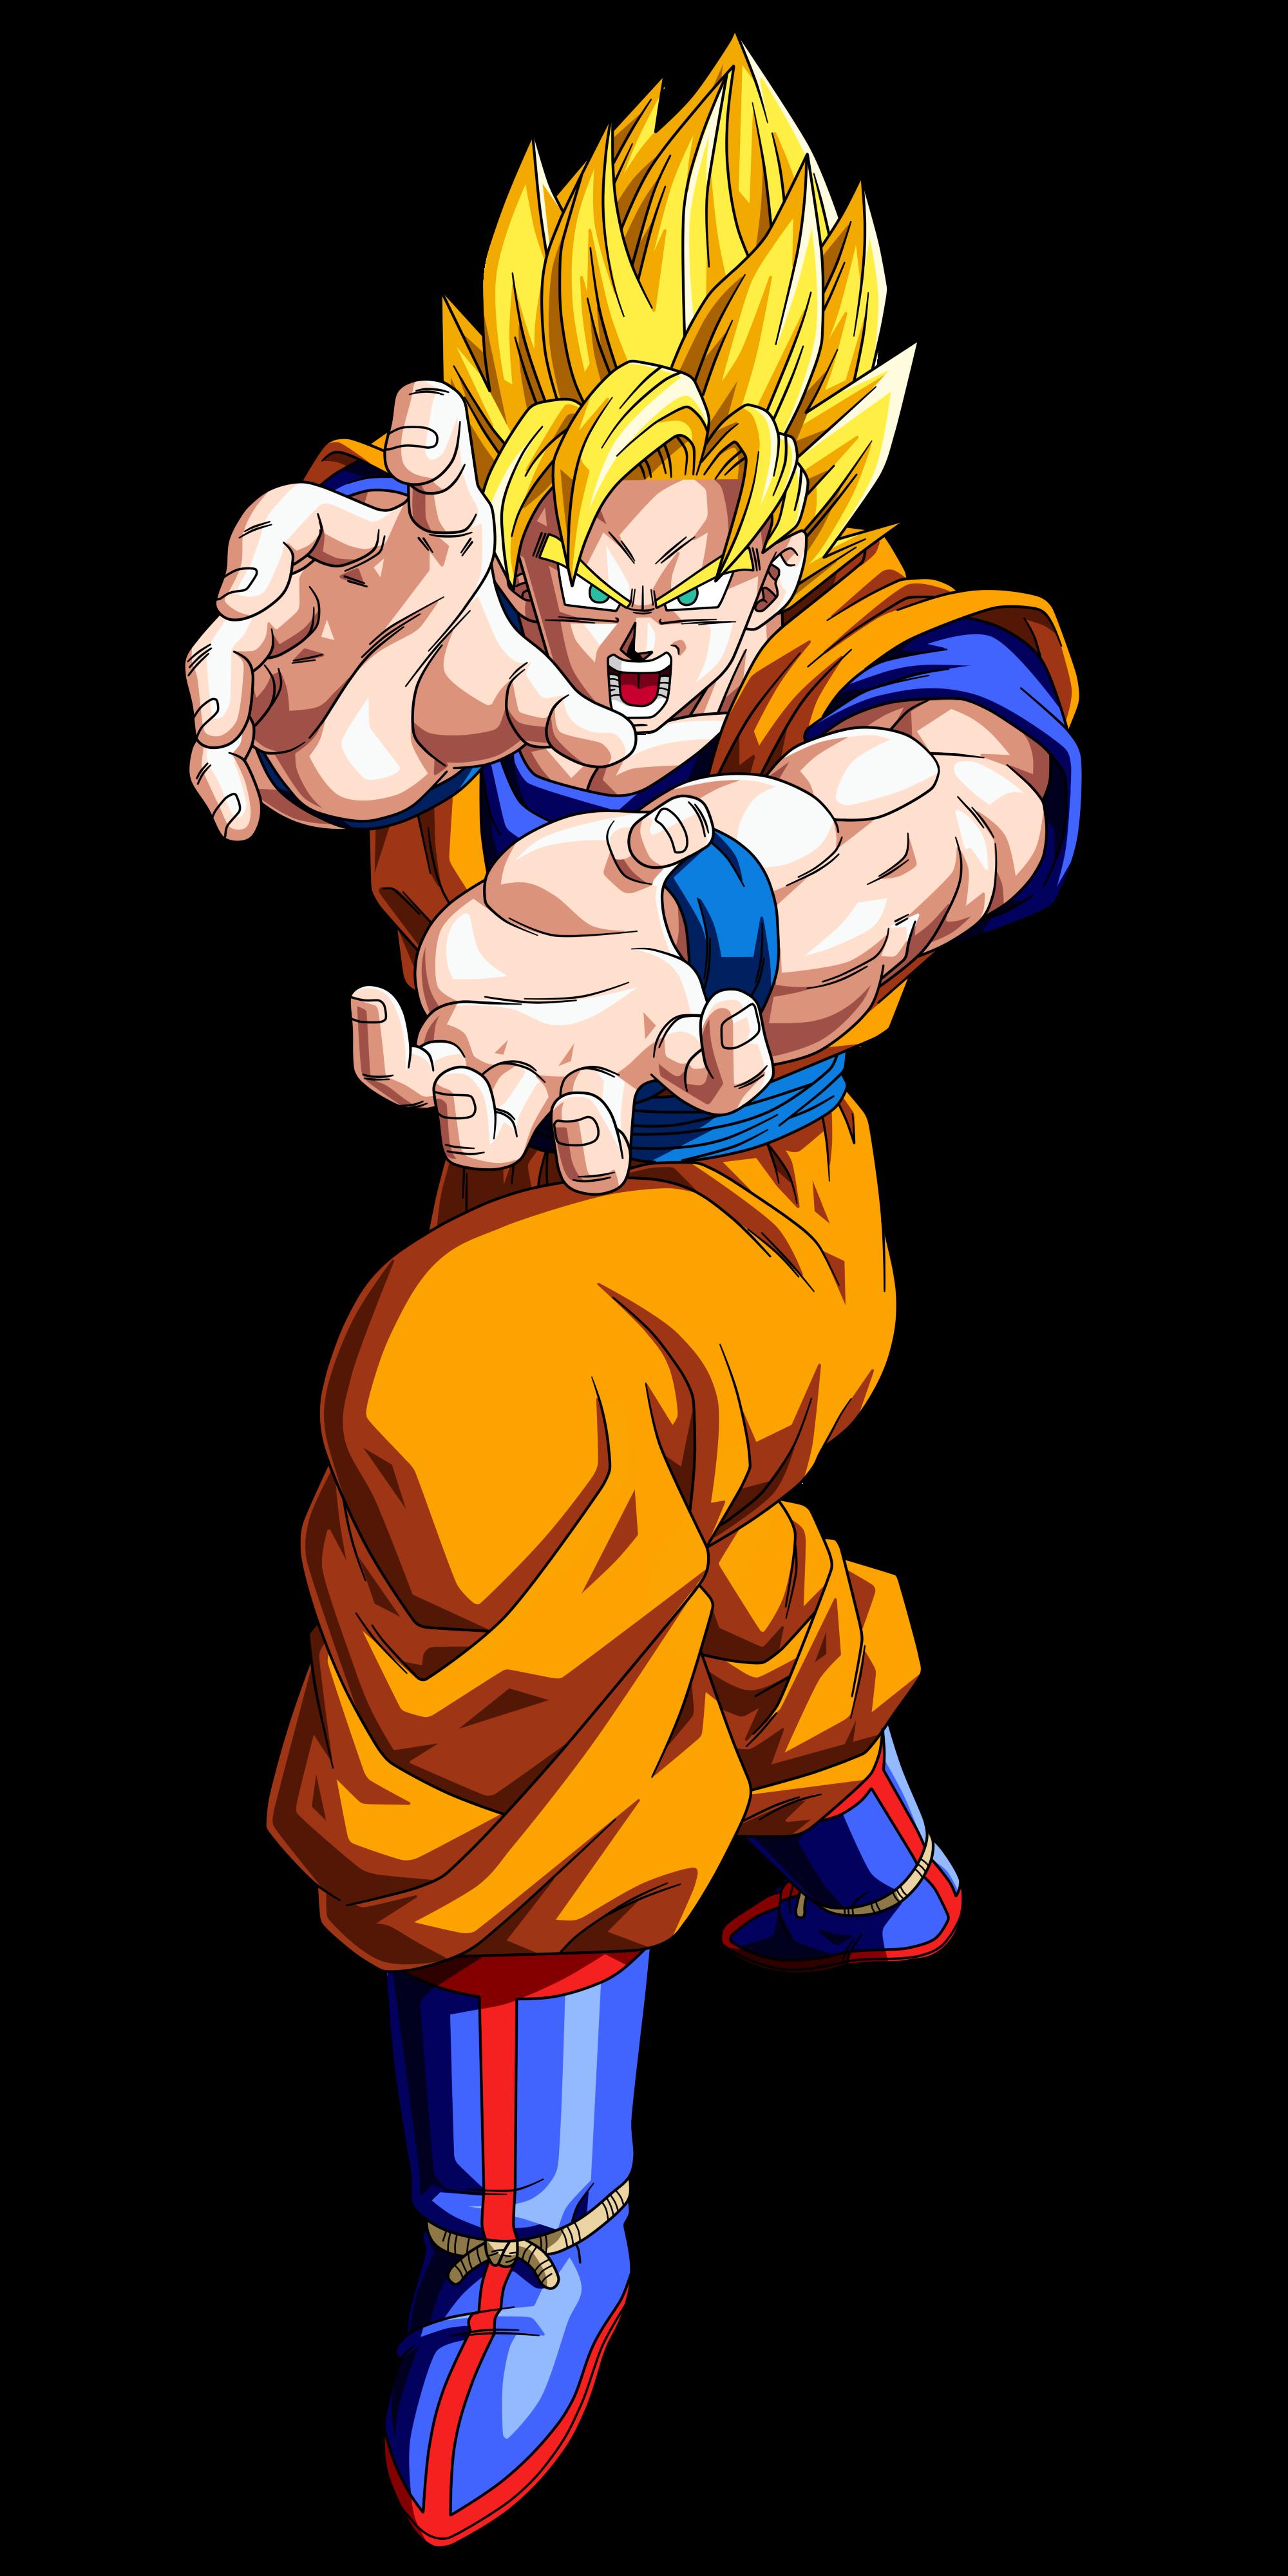 Imagen  Goku ssj alivepng  Dragon Ball Fanon Wiki  FANDOM